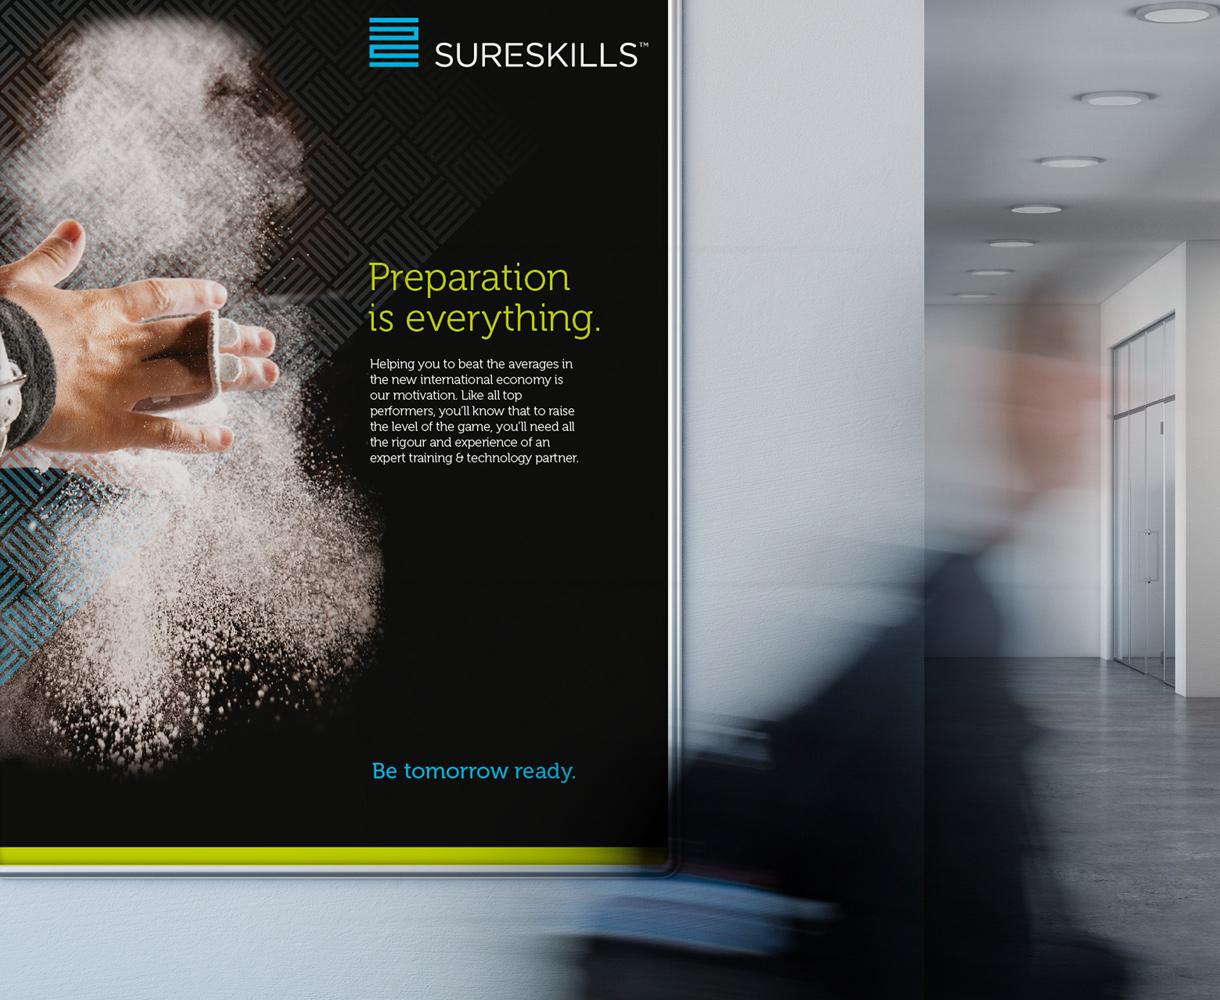 Sureskills Brand Identity Development Poster design